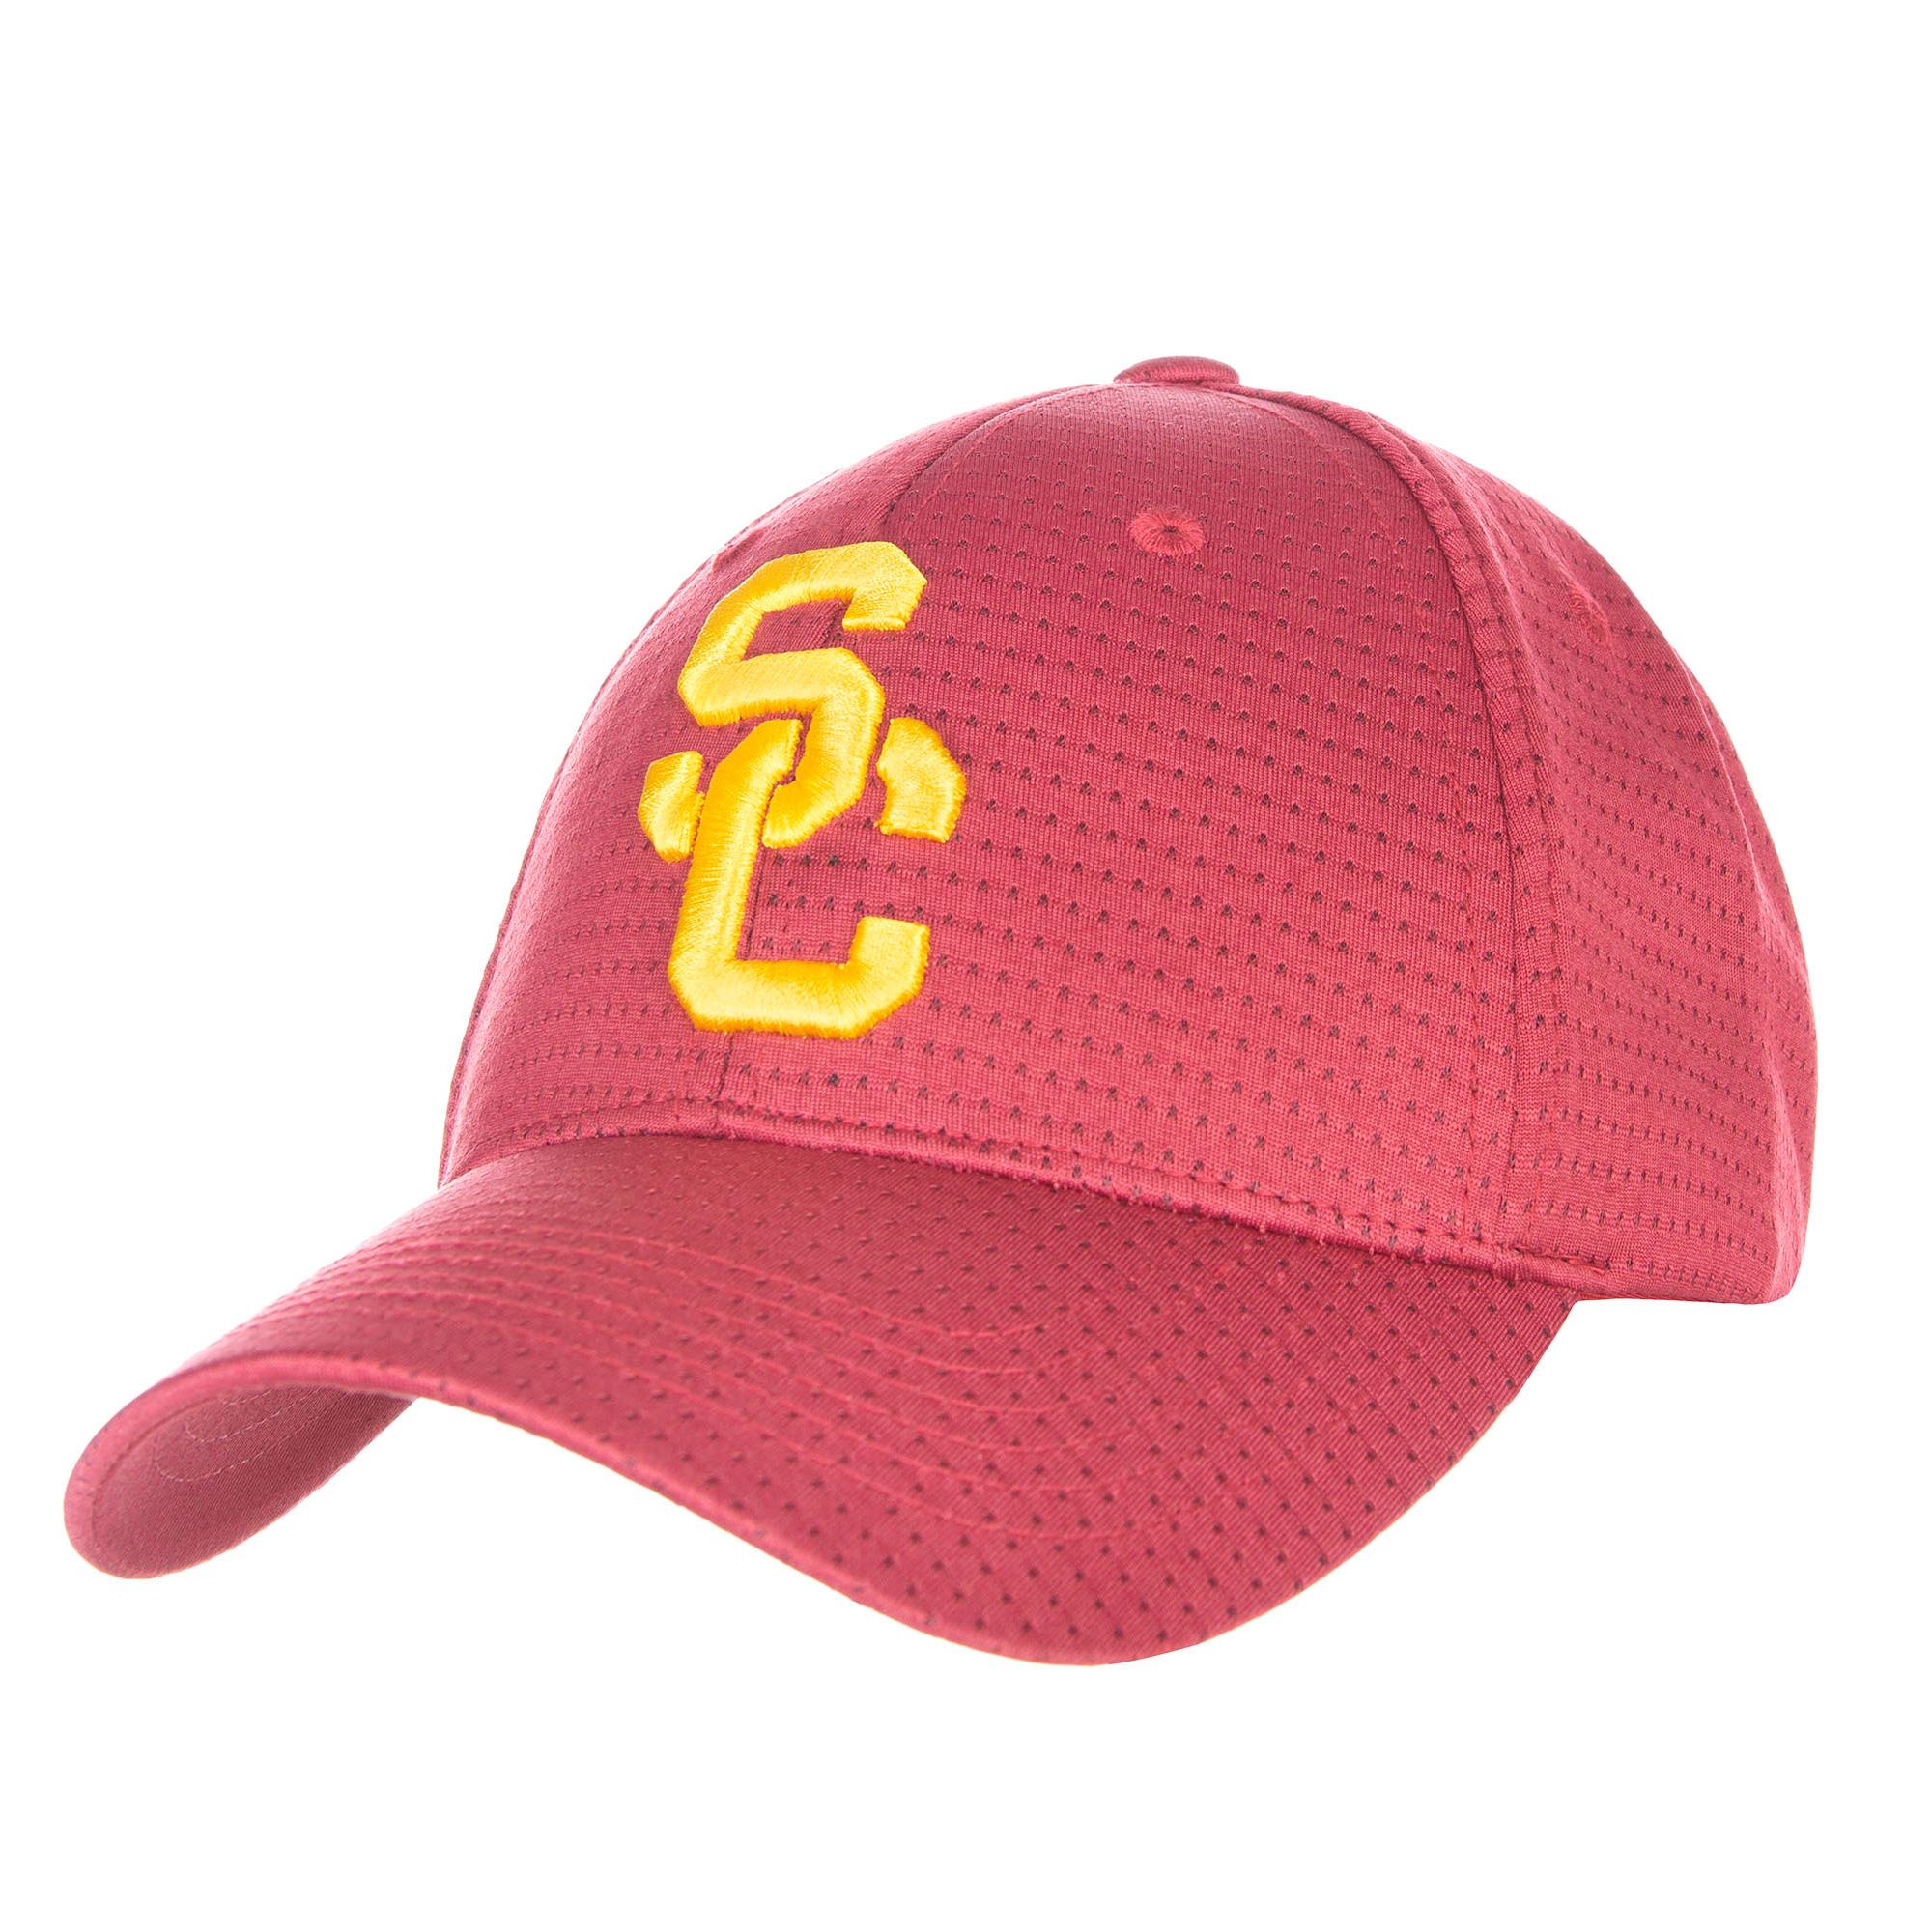 Men's Cardinal USC Trojans Grafton Adjustable Hat - OSFA